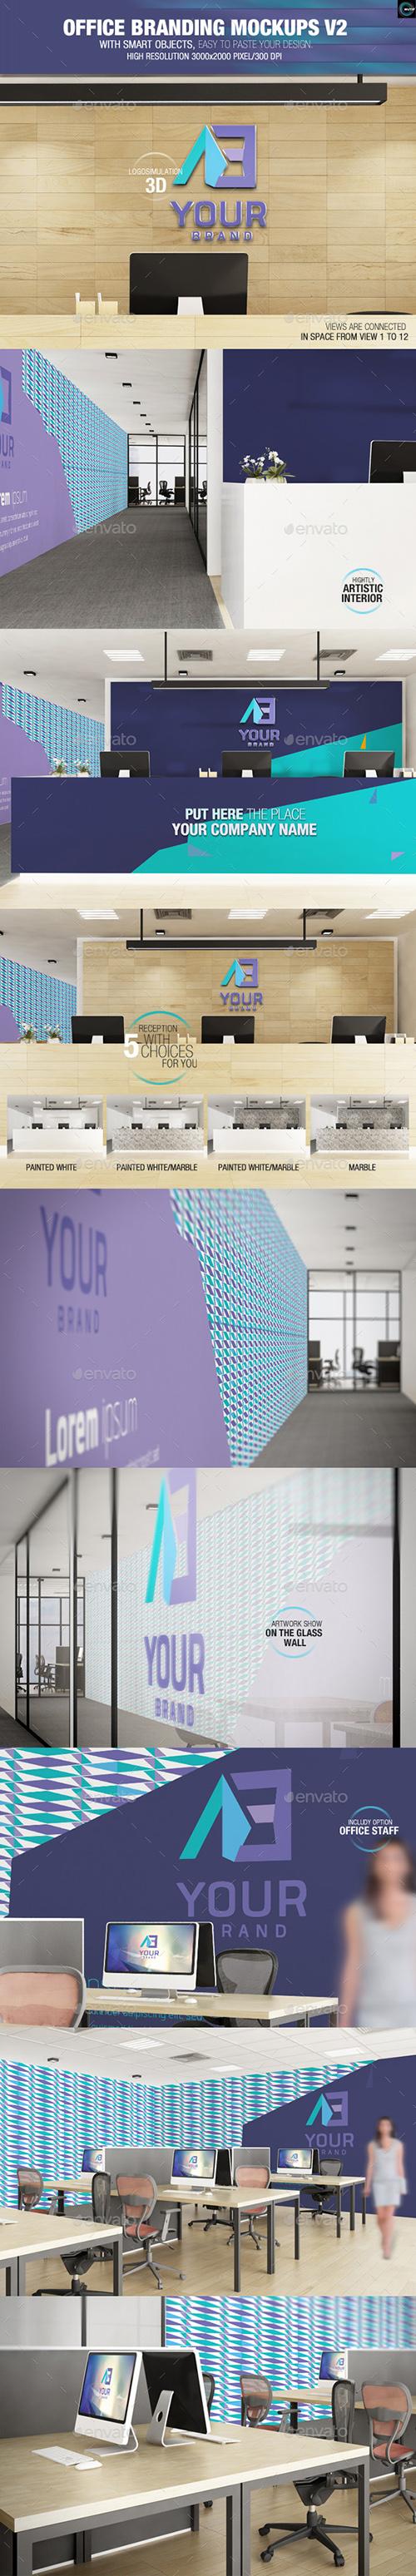 GraphicRiver - Office Branding Mockups V2 8180632